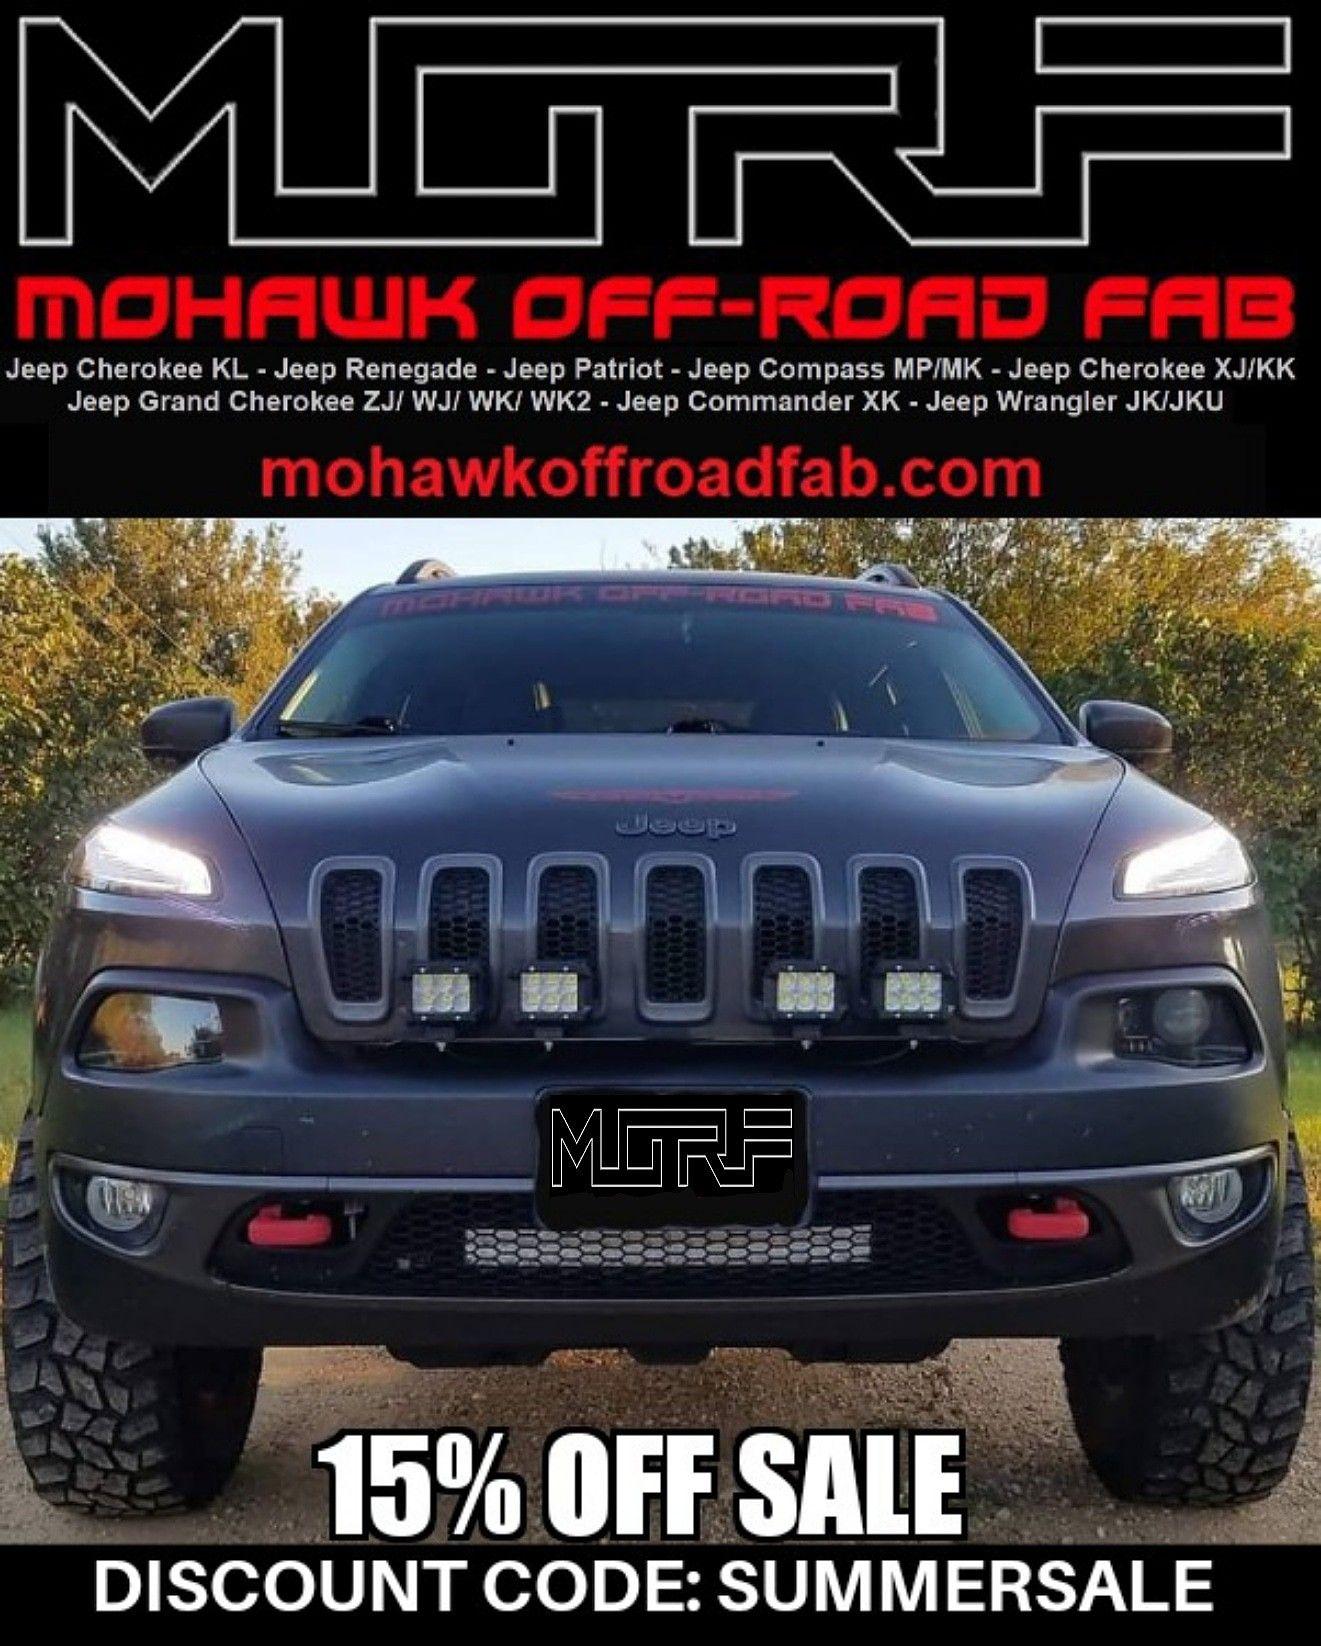 Pin By Mohawk Off Road Fab On Jeep Cherokee Kl Trailhawk Pod Light Bar Bracket Mounts Jeep Commander Jeep Grand Cherokee Zj Jeep Patriot